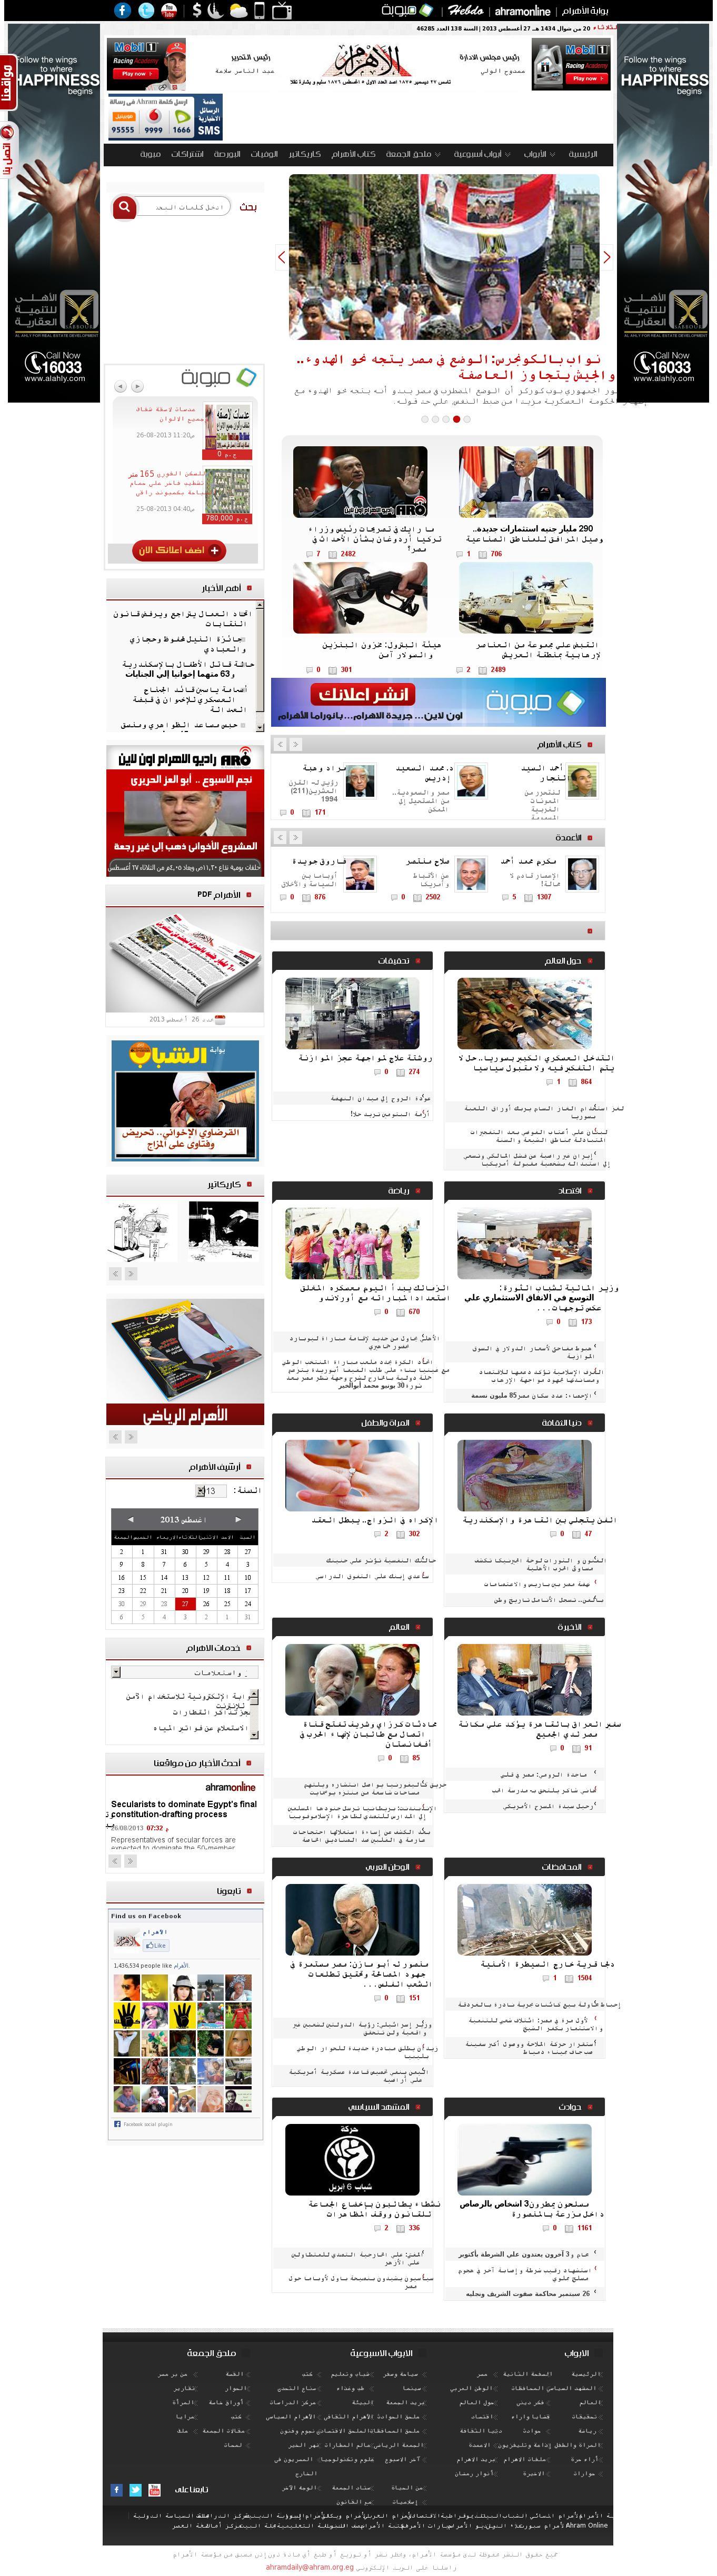 Al-Ahram at Tuesday Aug. 27, 2013, 7 a.m. UTC